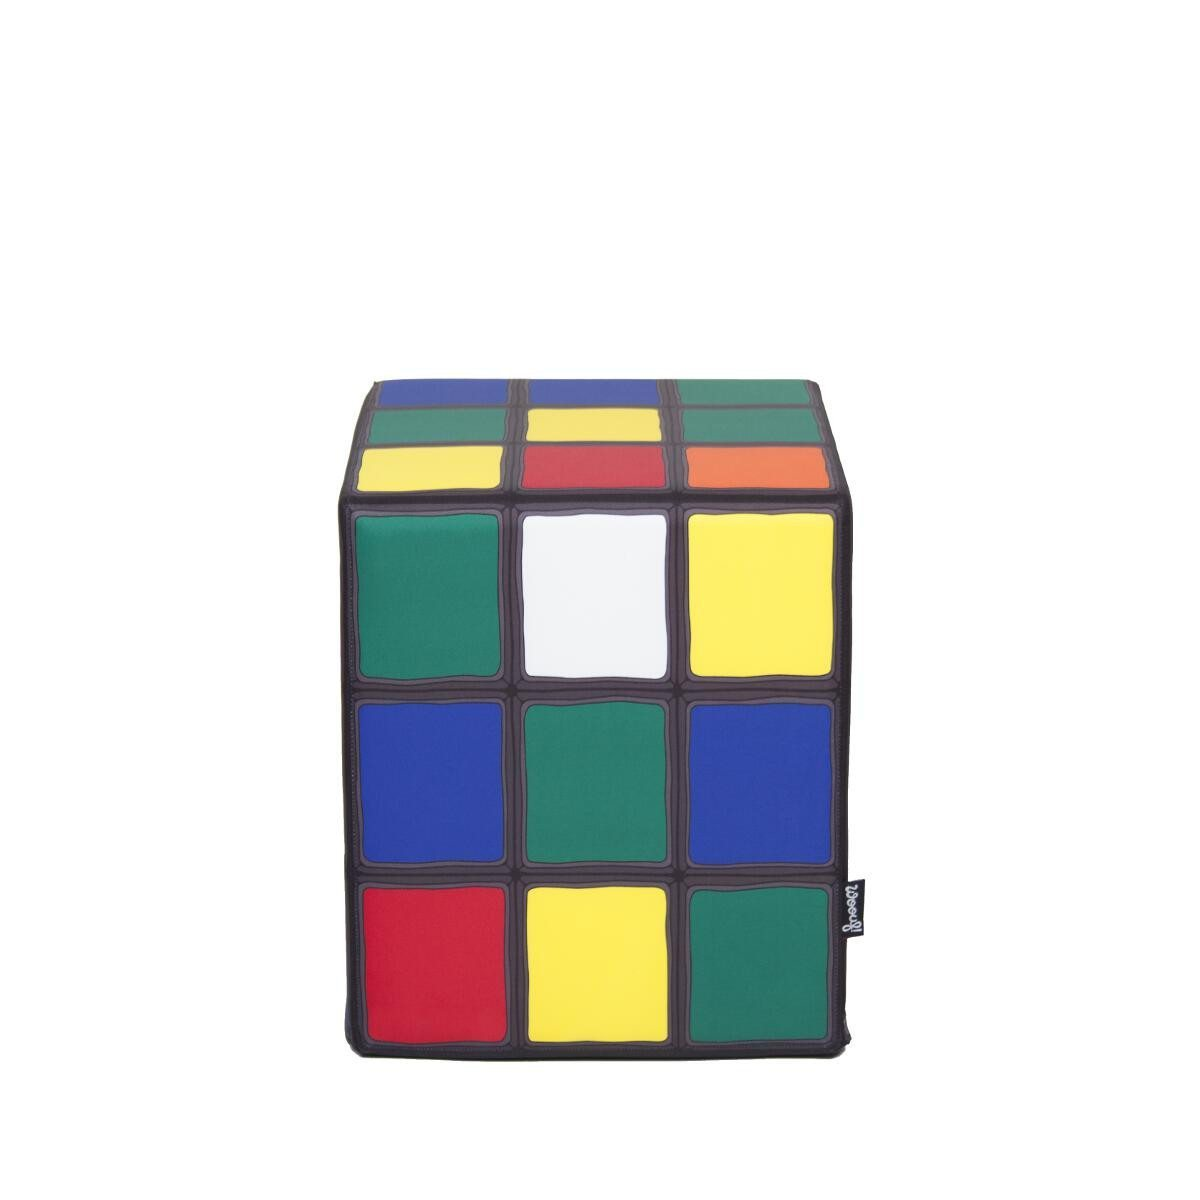 Original Puf cubo de Rubik